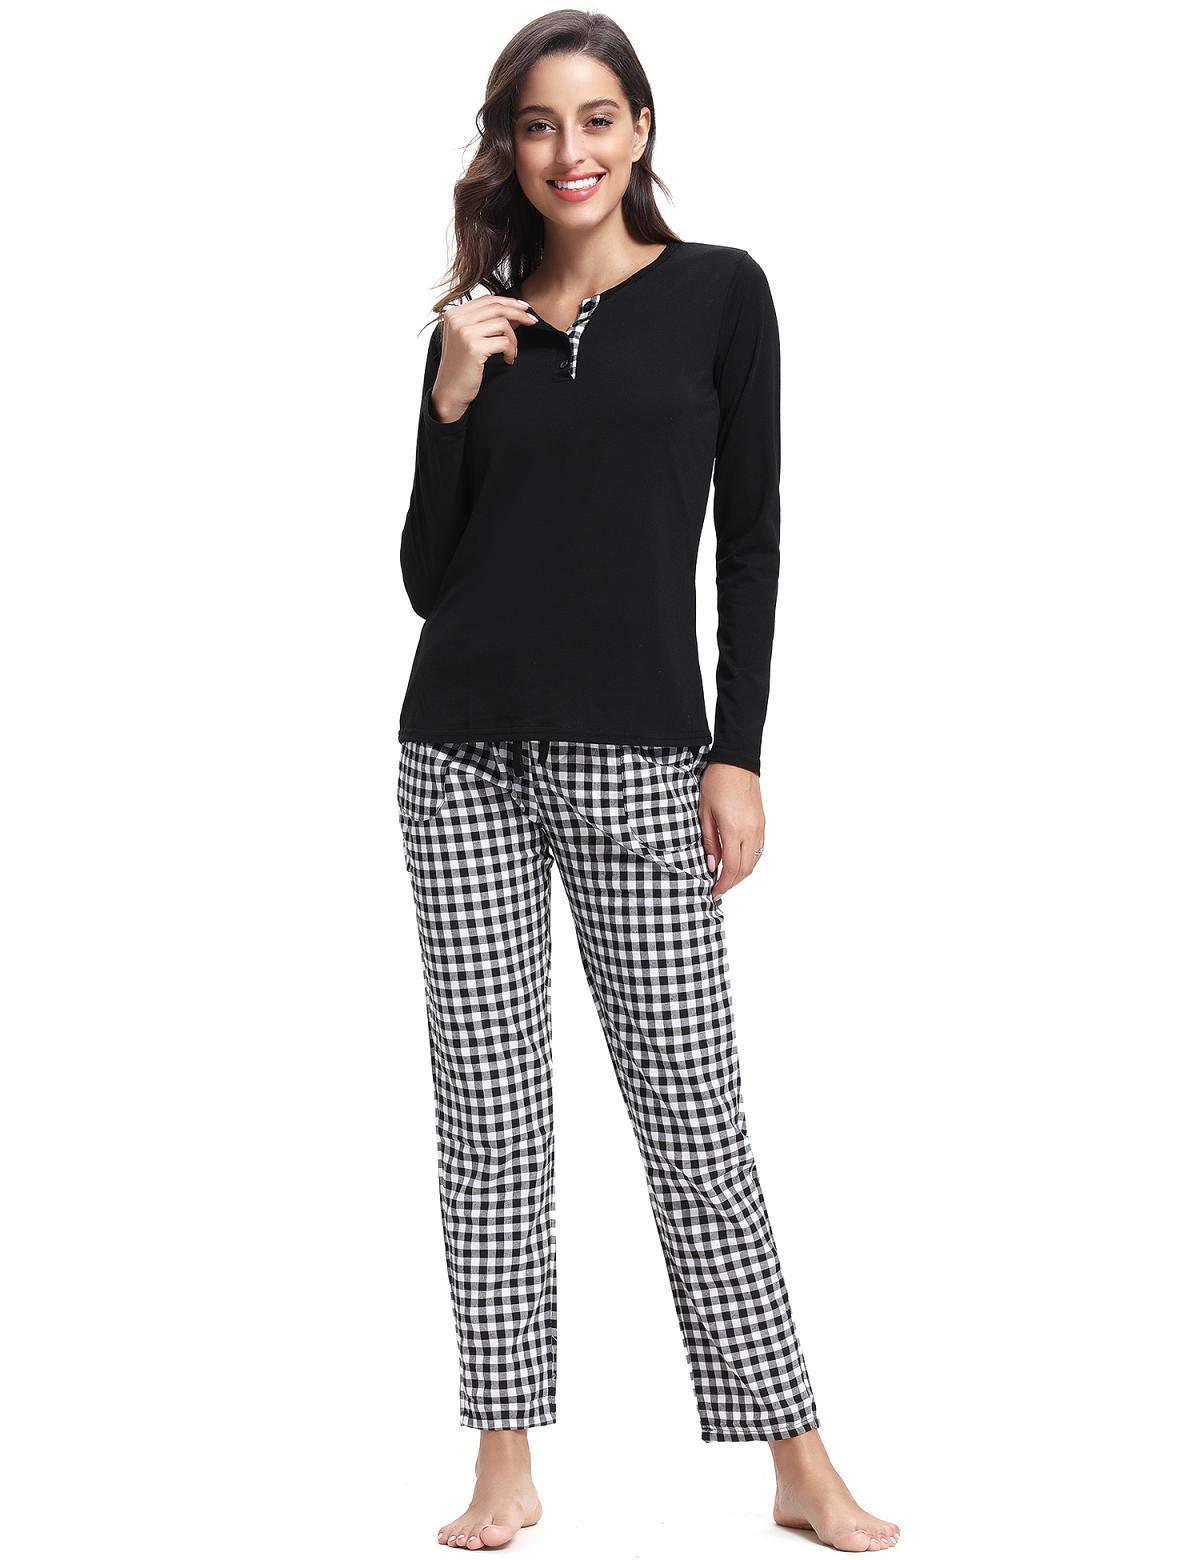 6eca05cf07 Abollria Pijamas Mujer Algodon Ropa de Domir Elegante Manga Pantalon Largos  product image